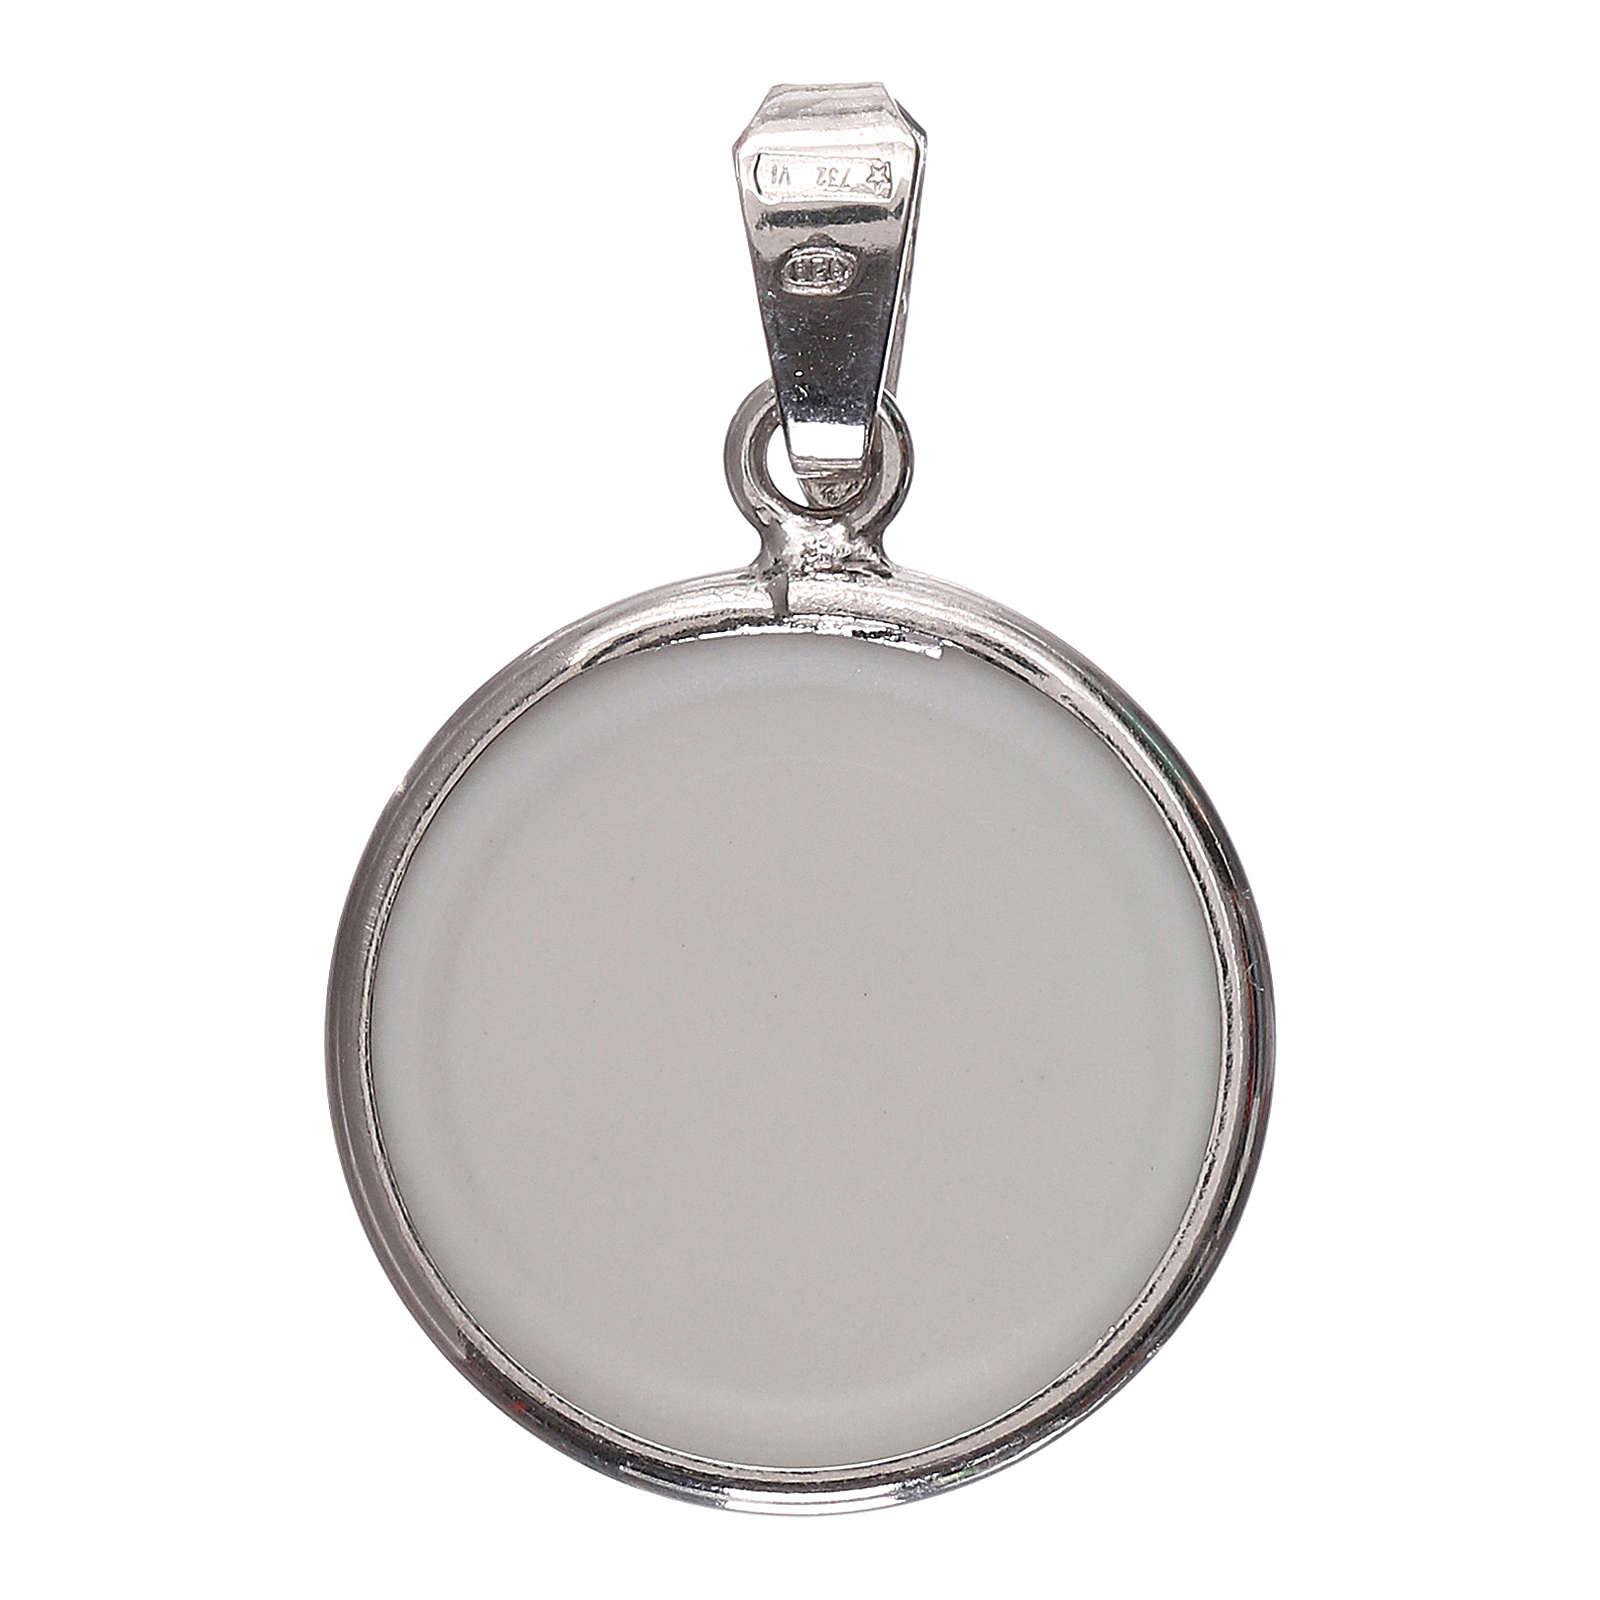 Medaglia tonda porcellana/argento 925 luna/stelle 1,8 cm 4